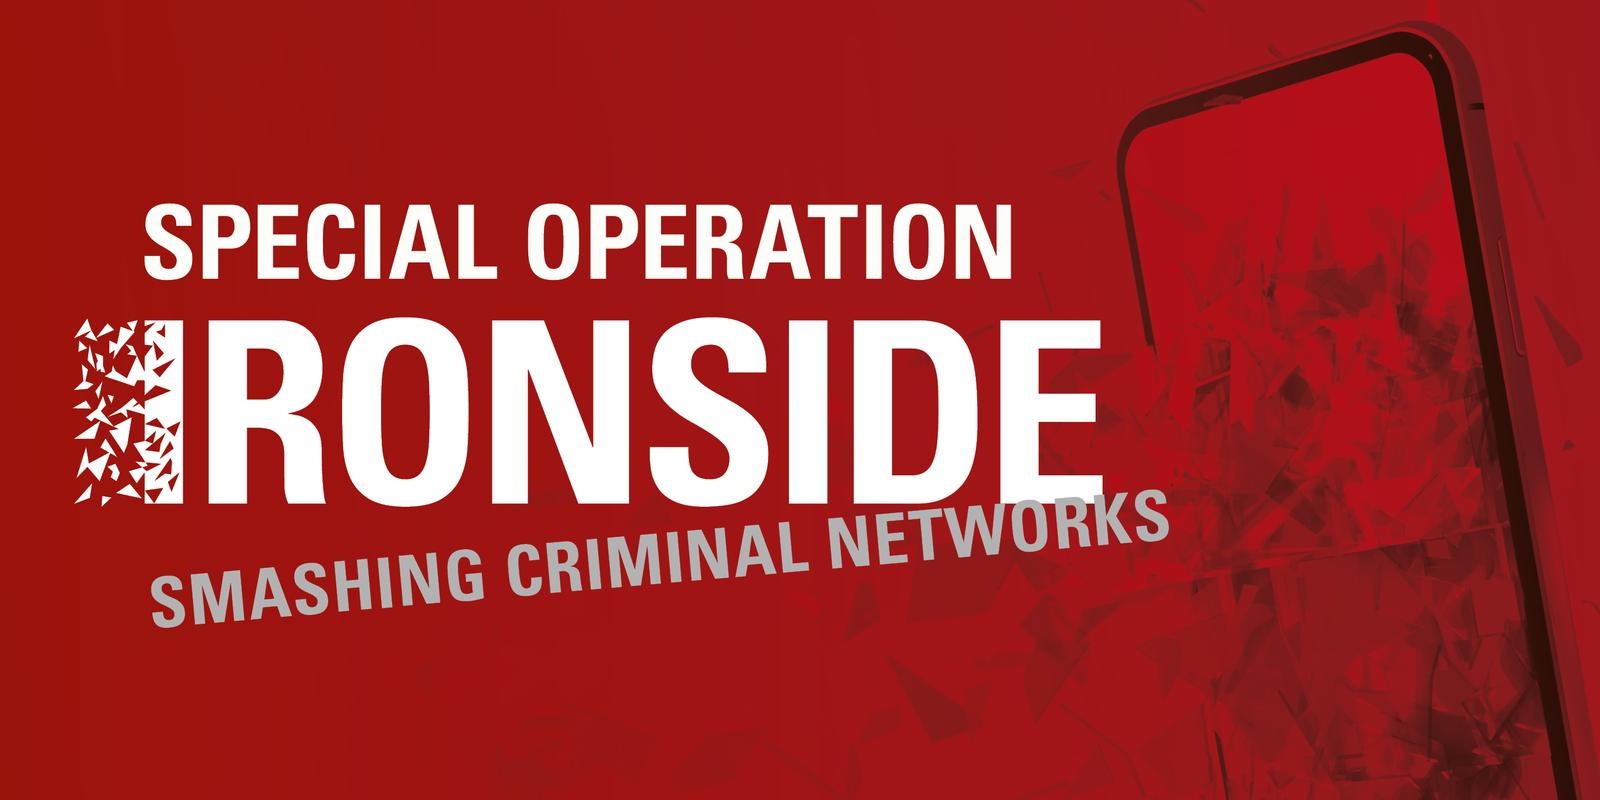 opération ironside - crime organisé - www.psycho-criminologie.com